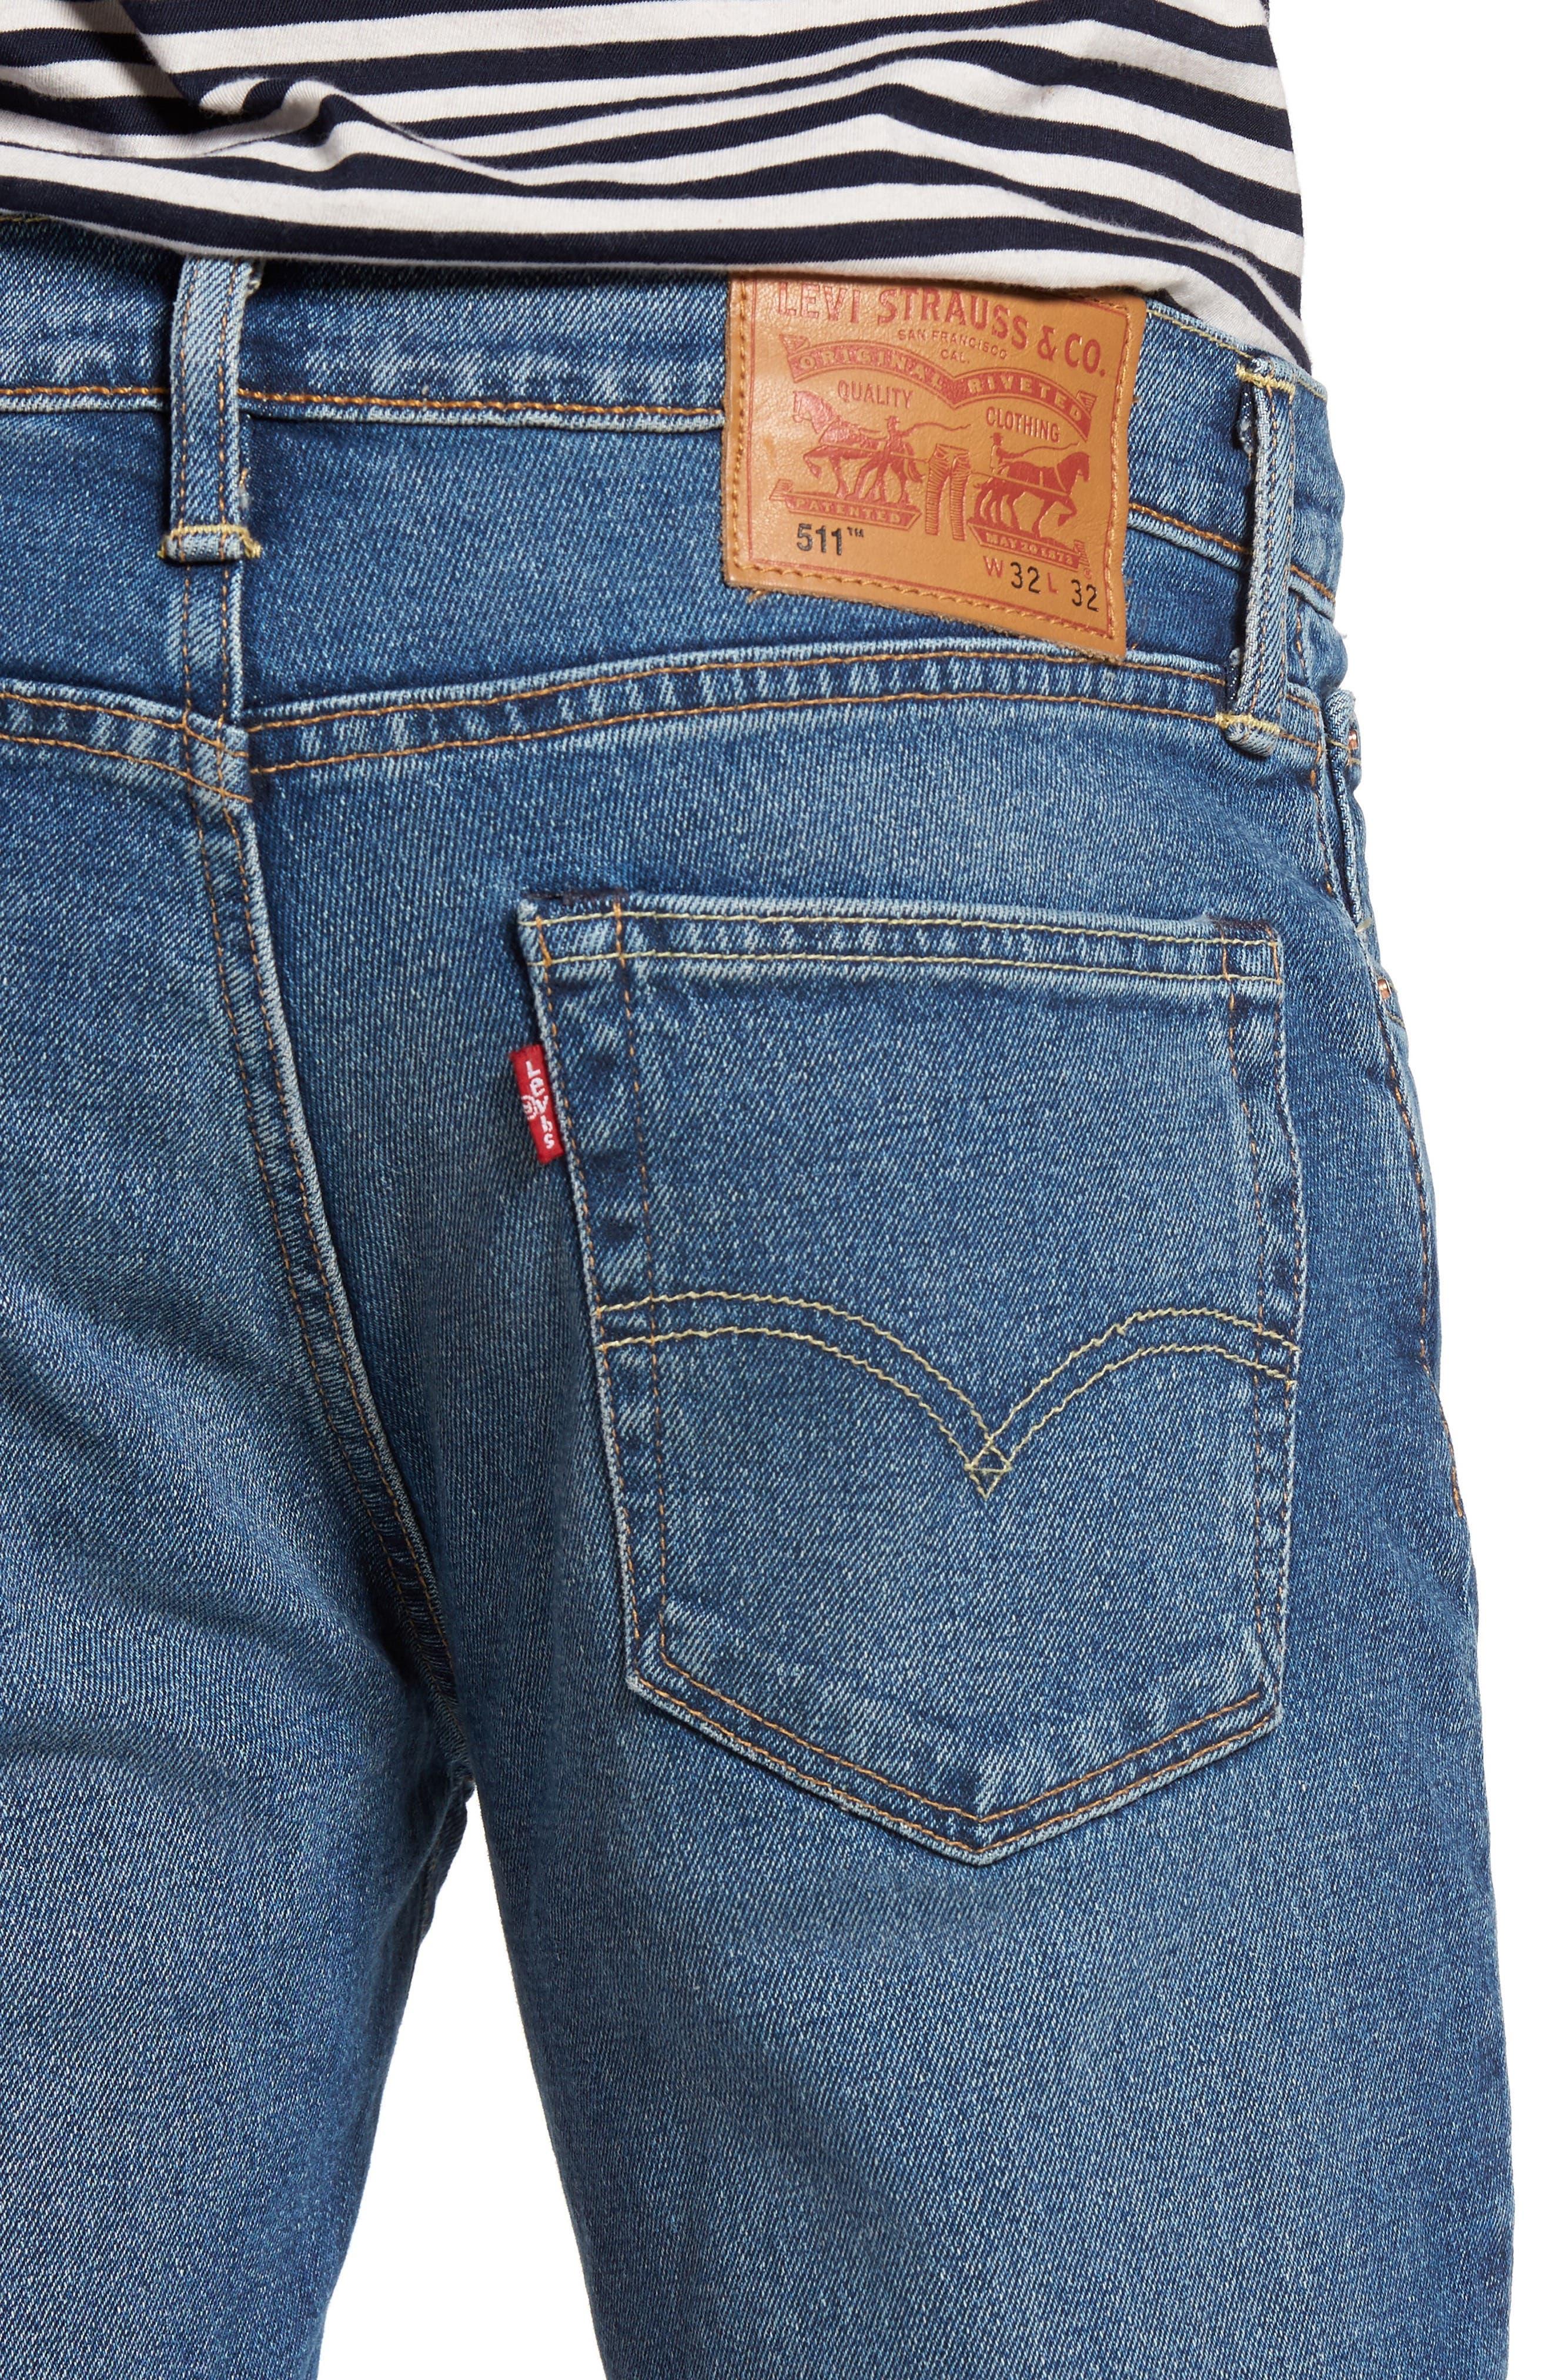 511<sup>™</sup> Slim Fit Jeans,                             Alternate thumbnail 4, color,                             401